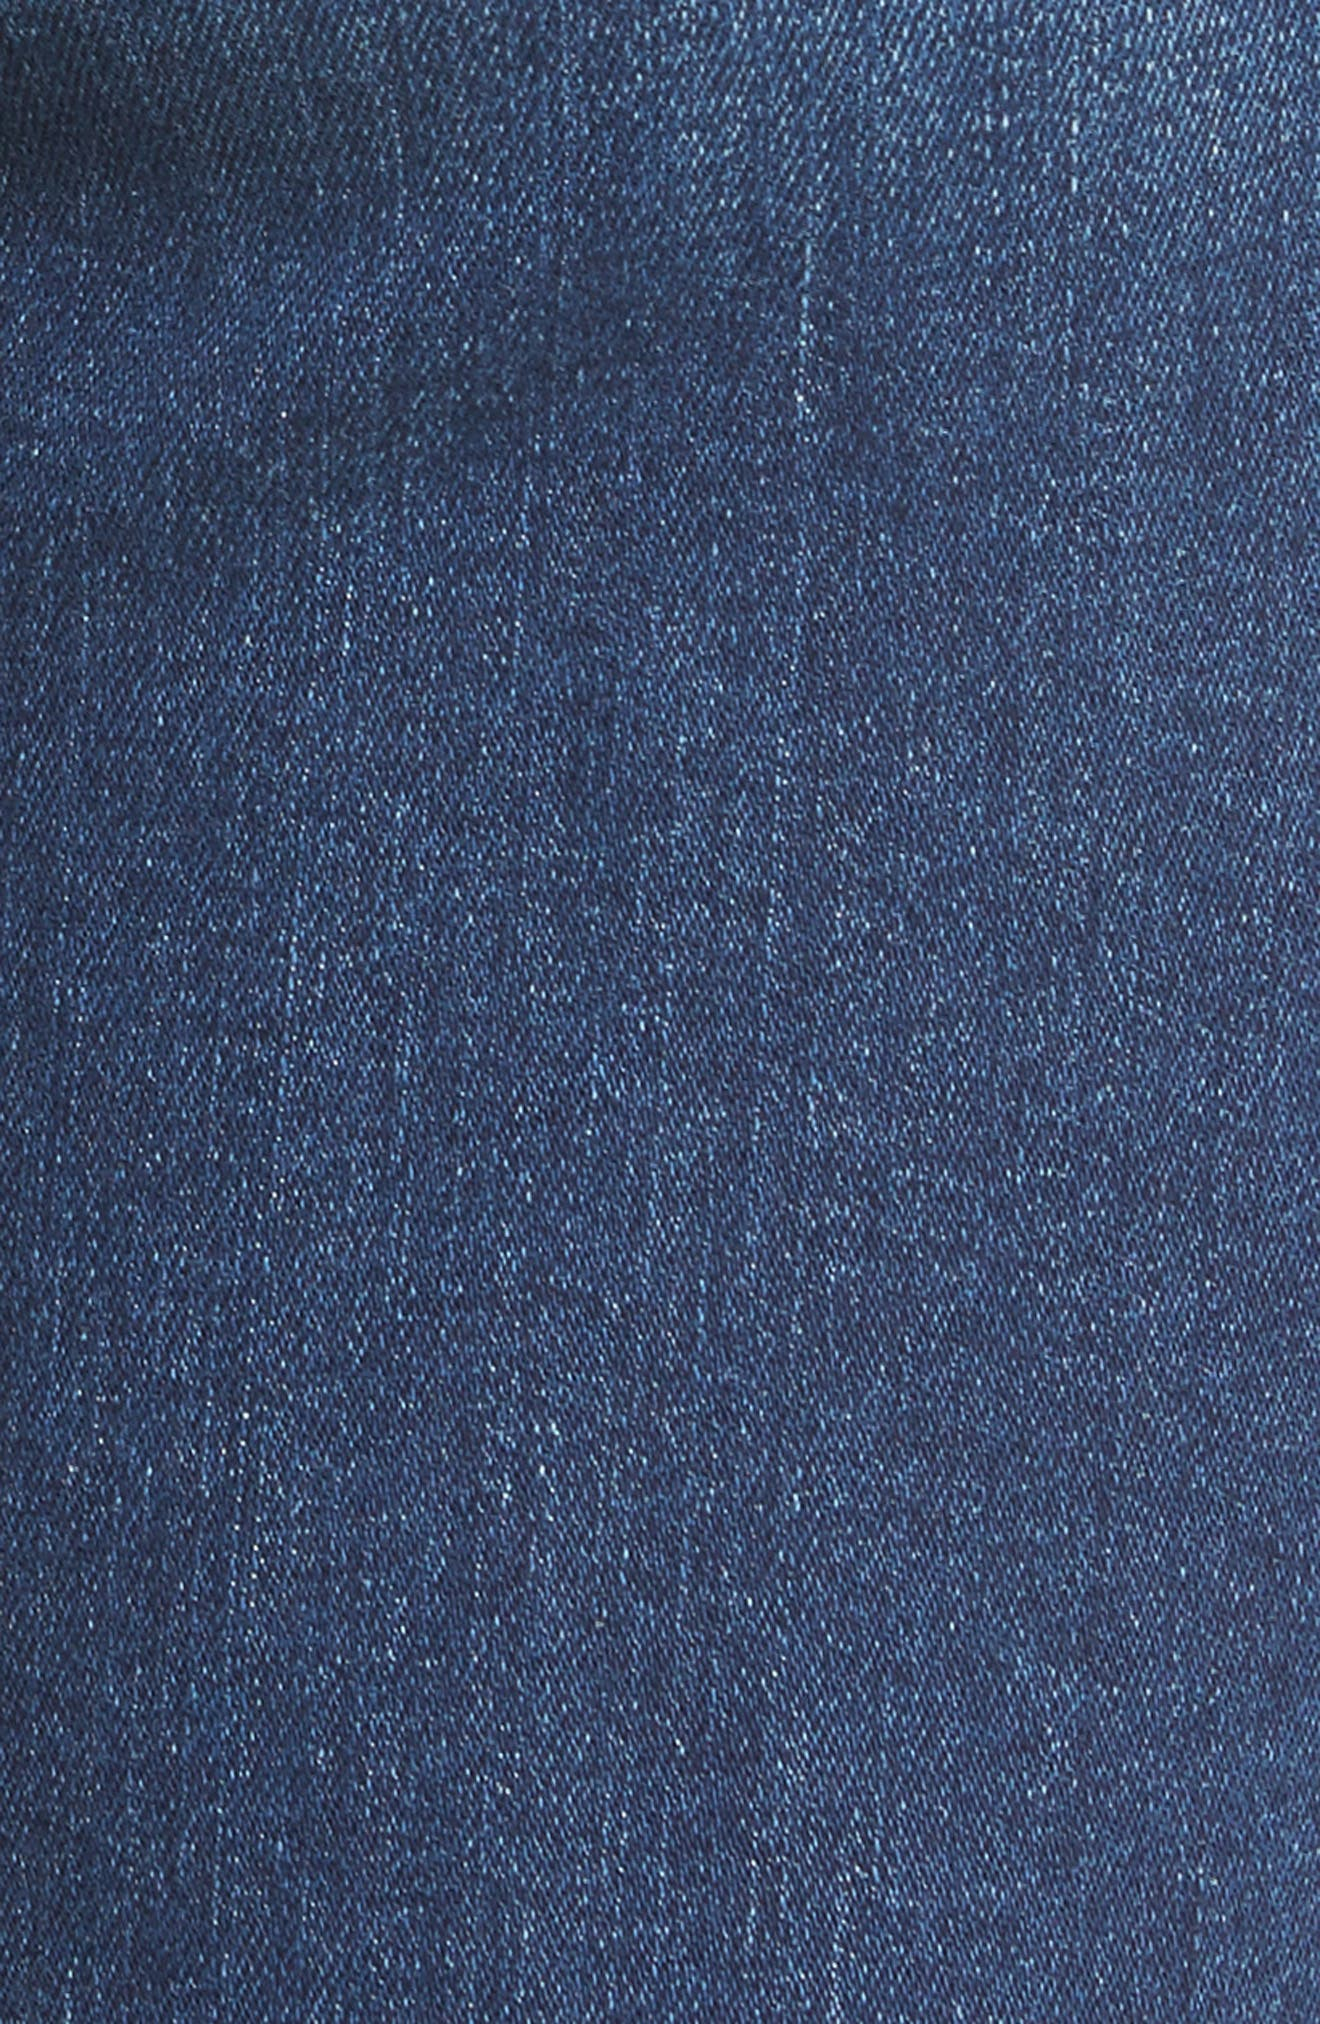 Skyline Skinny Jeans,                             Alternate thumbnail 6, color,                             400